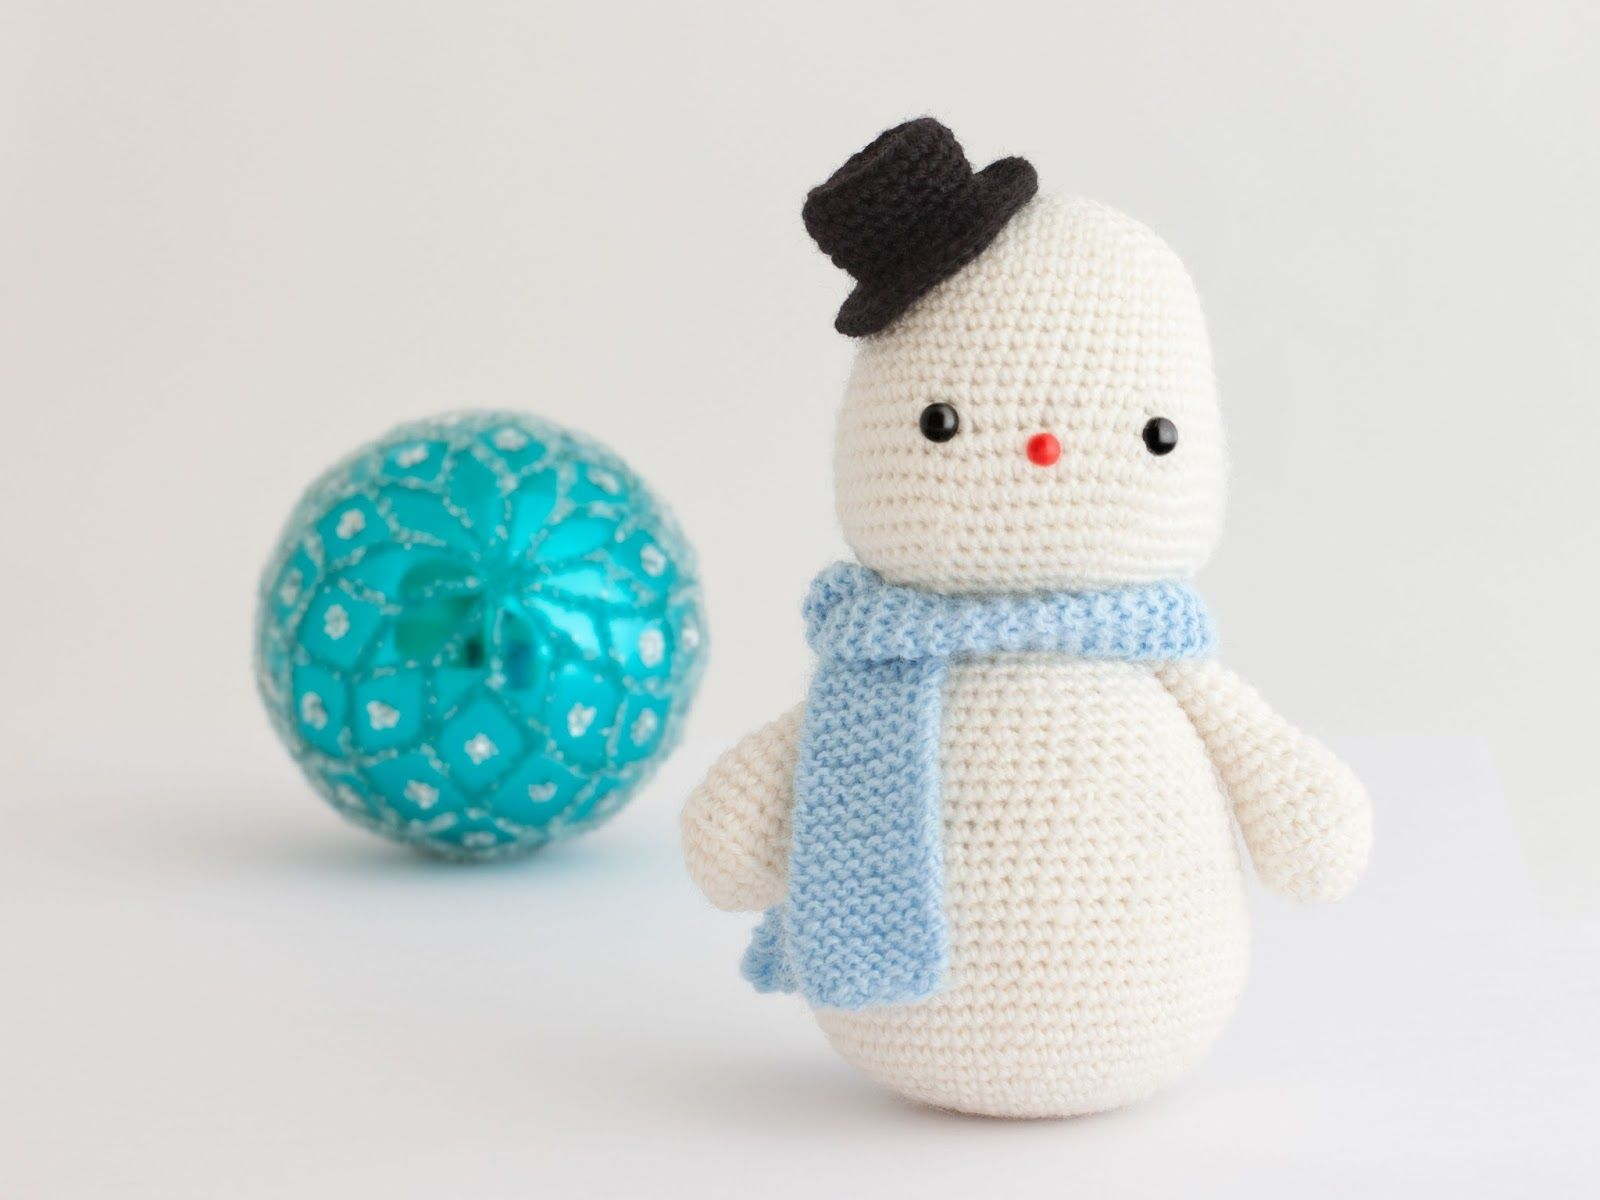 Amigurumi Snowman - FREE Crochet Pattern / Tutorial | Amigurumi ball ...